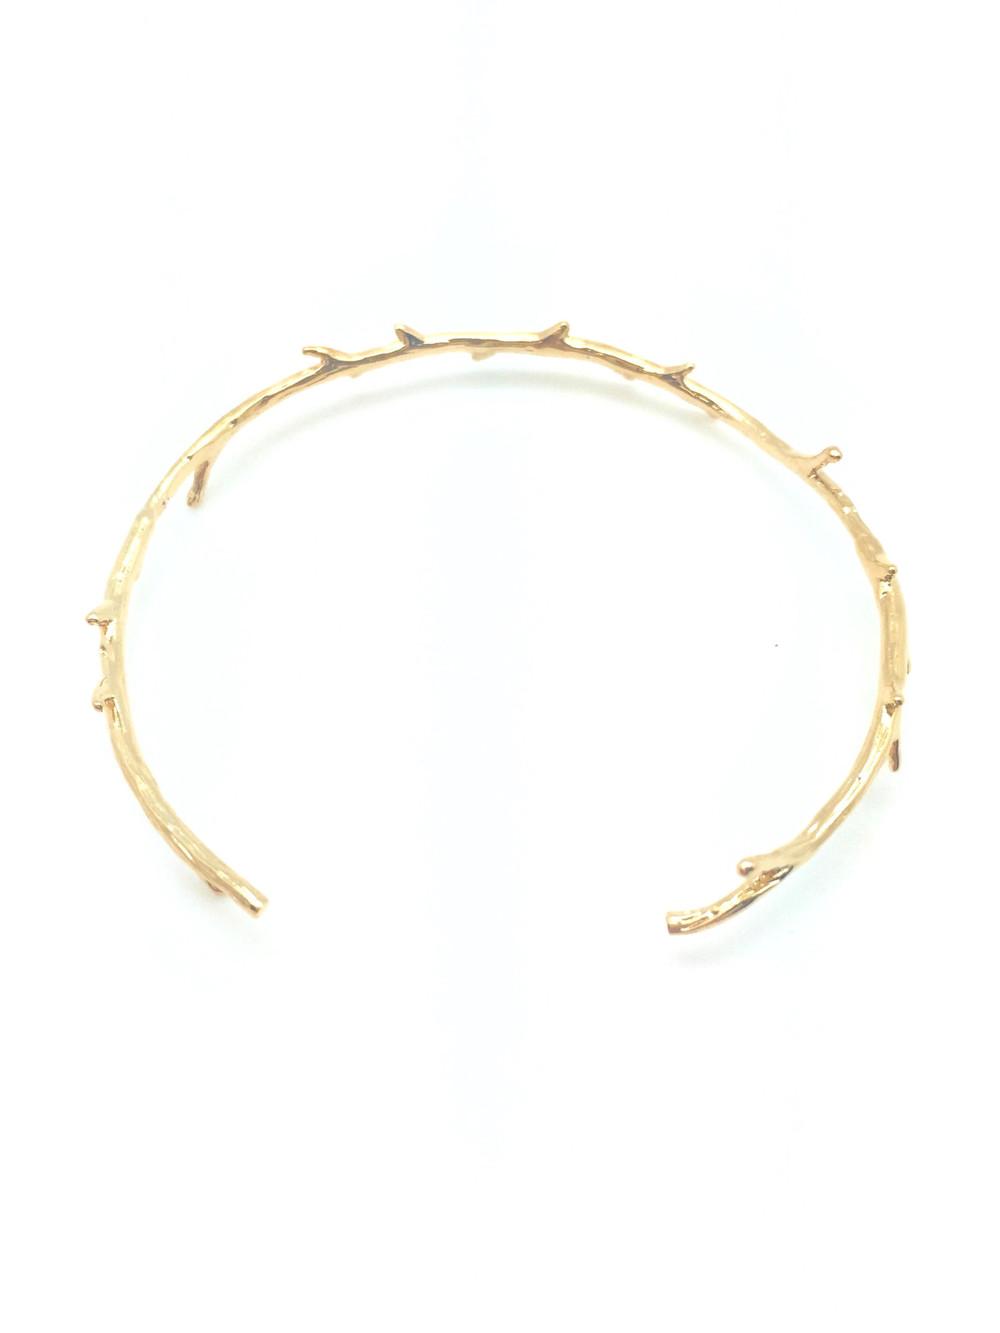 Kelley Bracelet $16